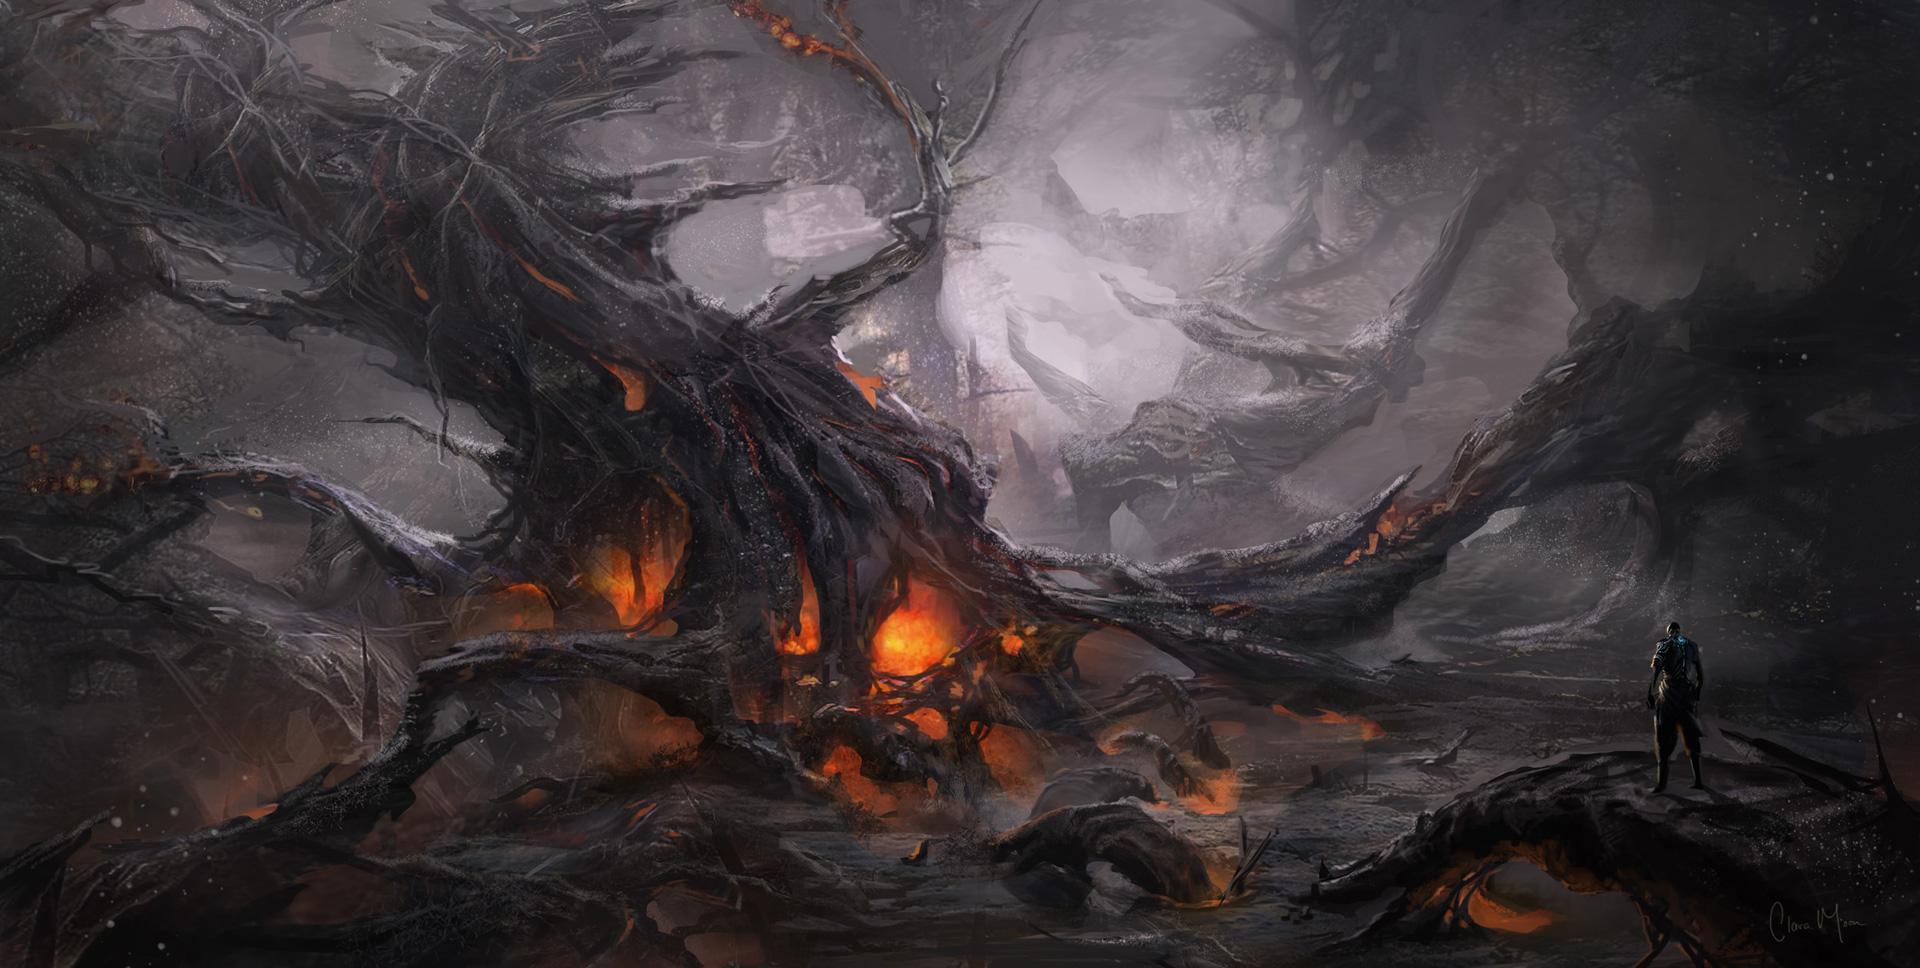 evil landscape background - photo #11